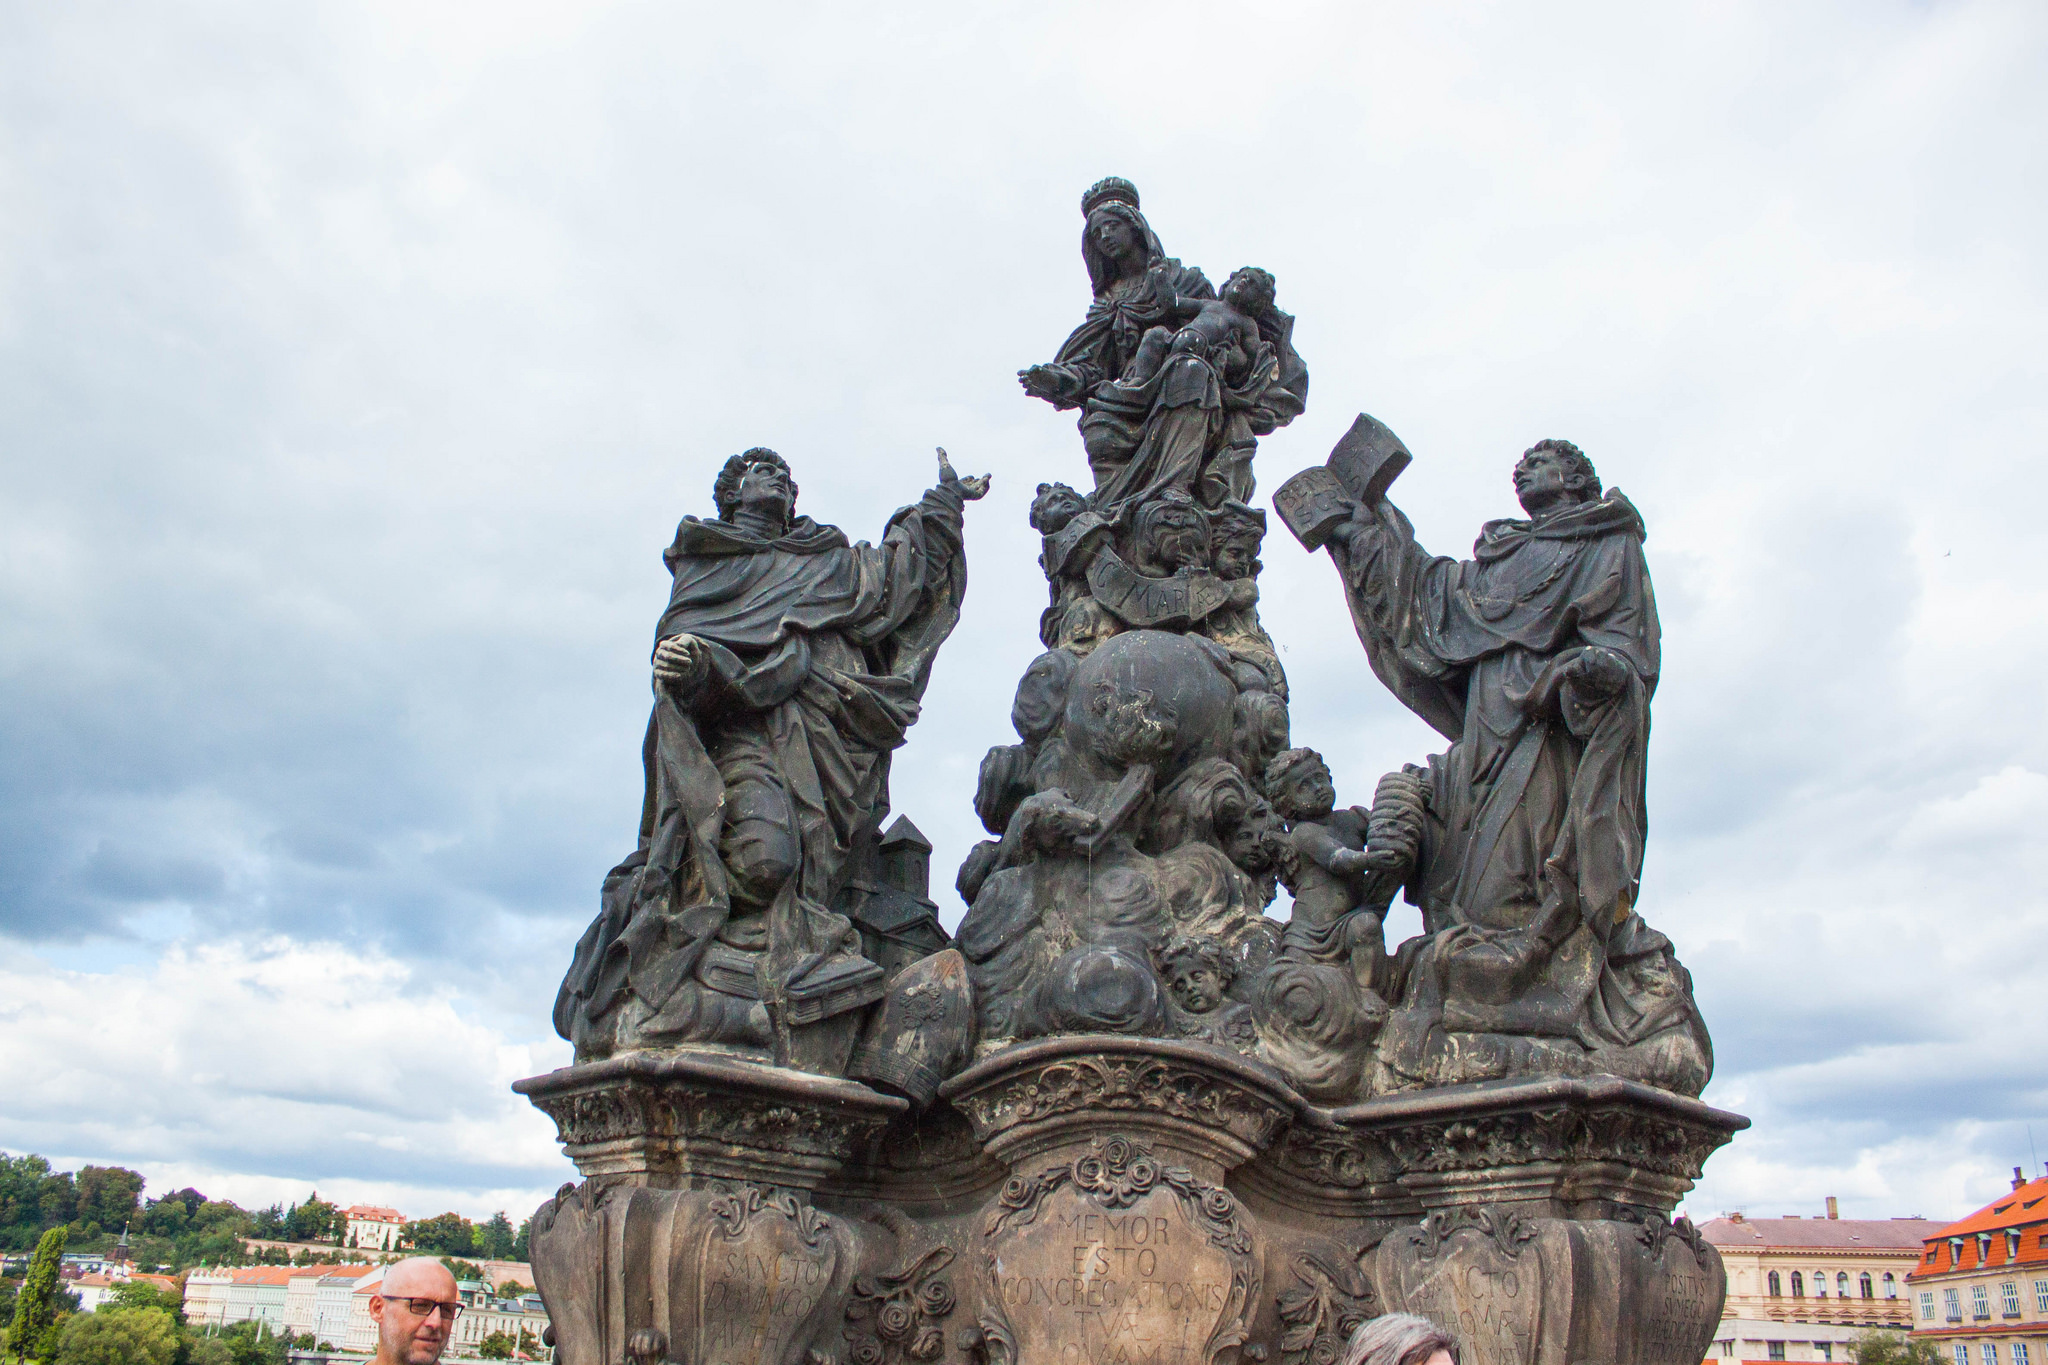 Guide to the Charles Bridge, Prague